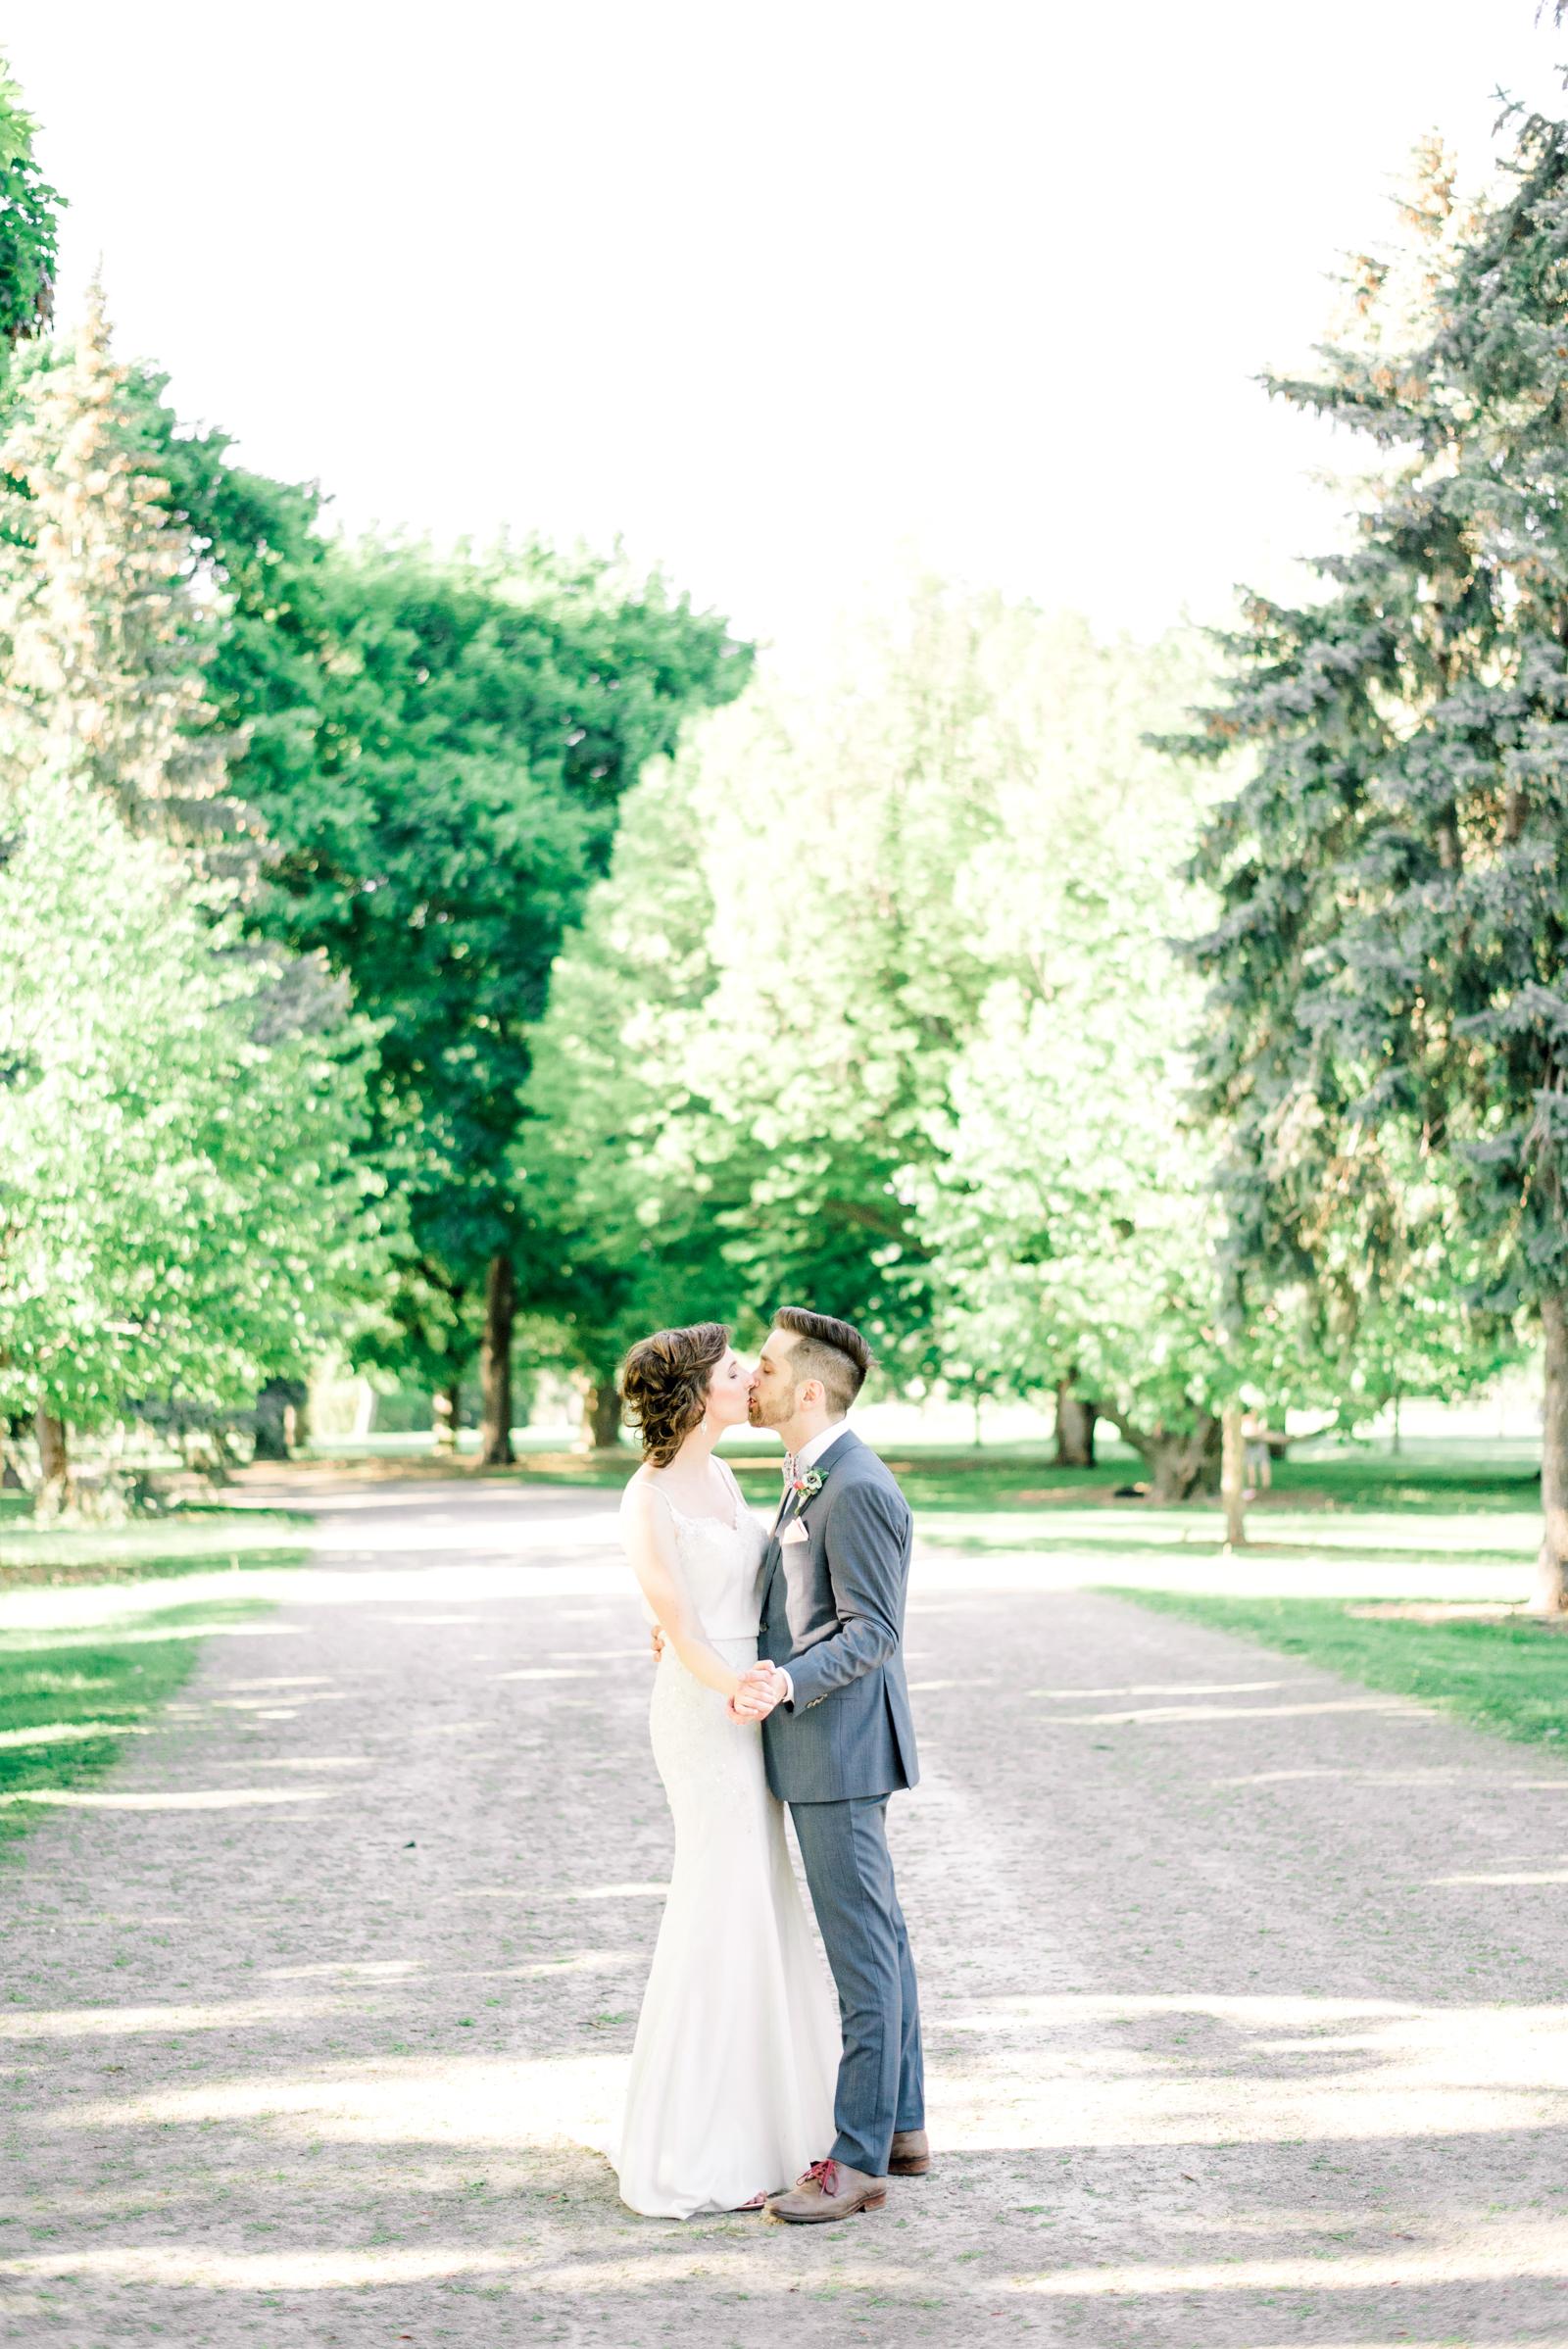 Meghan & Ben - Hamilton Gage Park Wedding -17.jpg